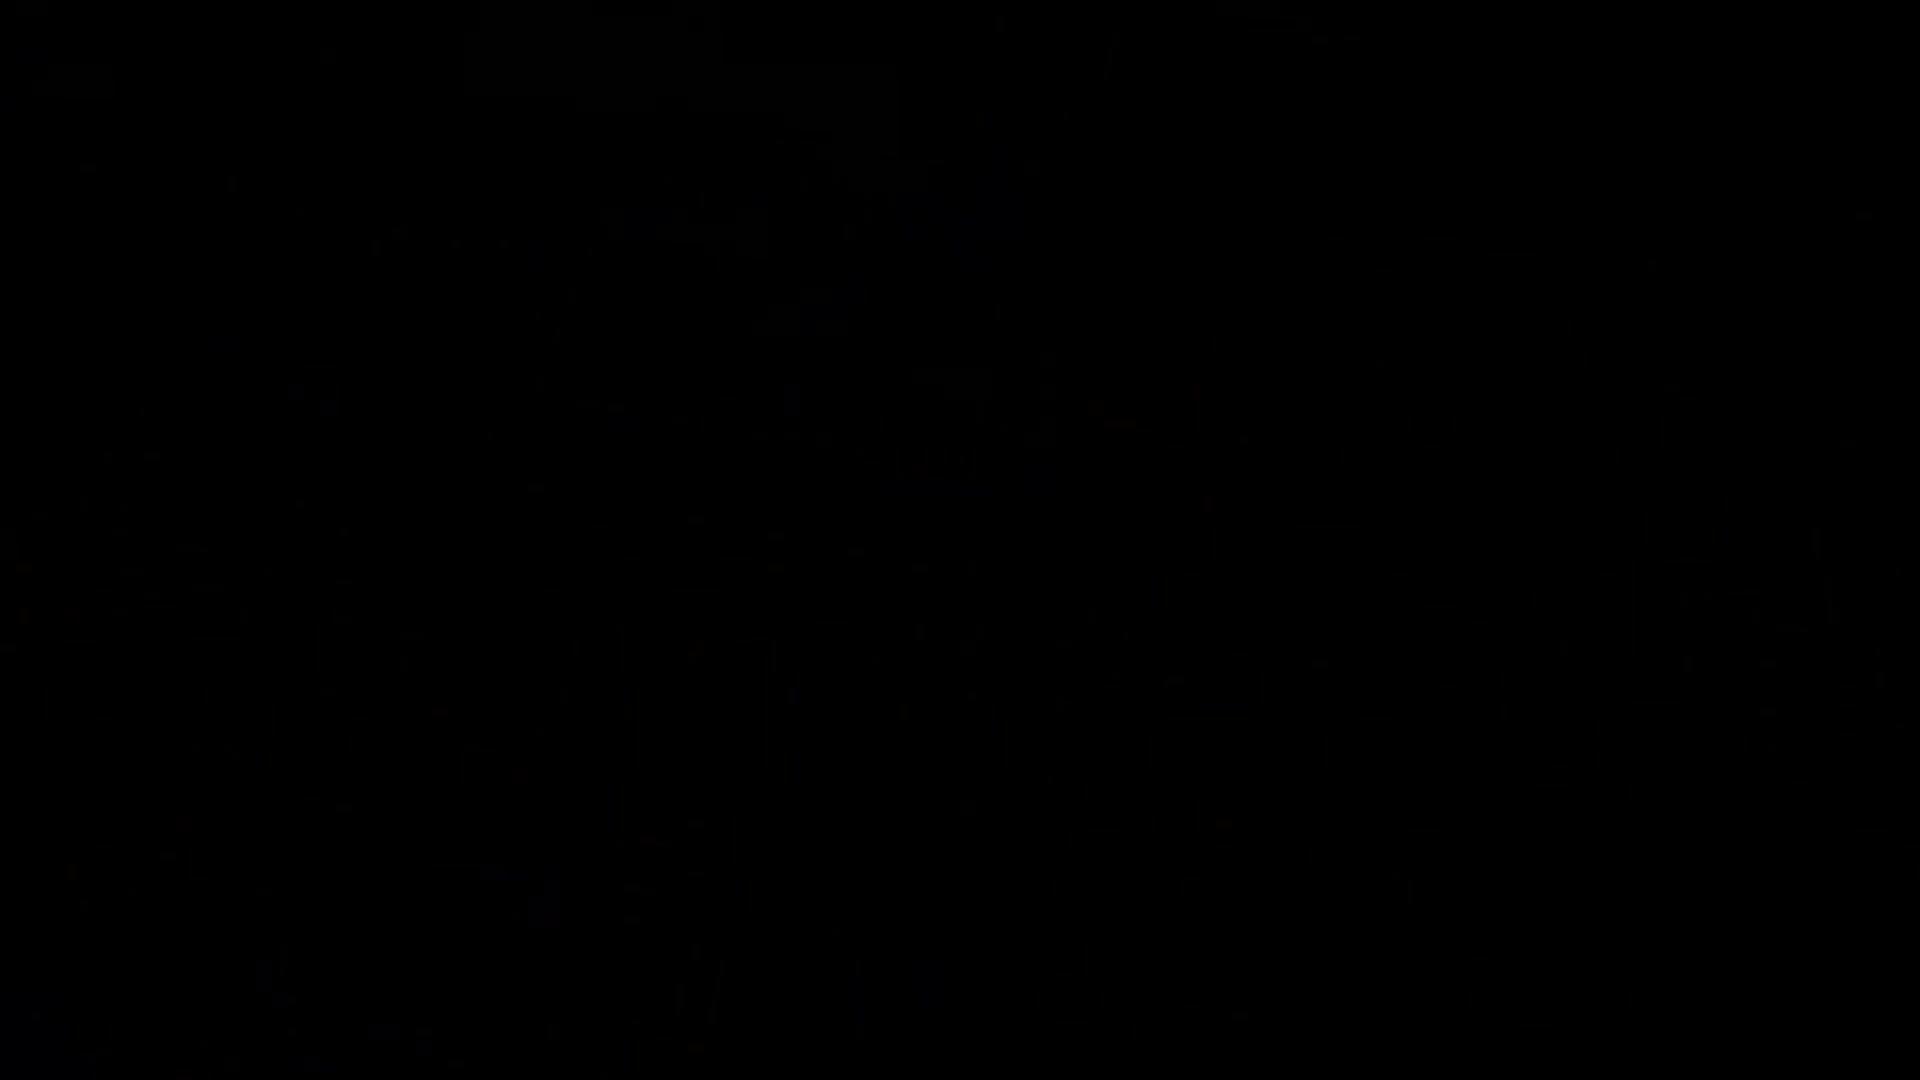 DisgusiedToast, Fedmyster, Fuslie, Hearthstone, IRL, Jakenbake, Lilypichu, OfflineTv, Pokimane, Sleightlymusical, VR, angelskimi, ariasaki, fortnite, jakenbakelive, league of legends, lol, starsmitten, xchocobars, Poki a Gamer | Kimi Confirmed Basic | Fed & Poki One Bite Challenge | Edison a Snail? GIFs